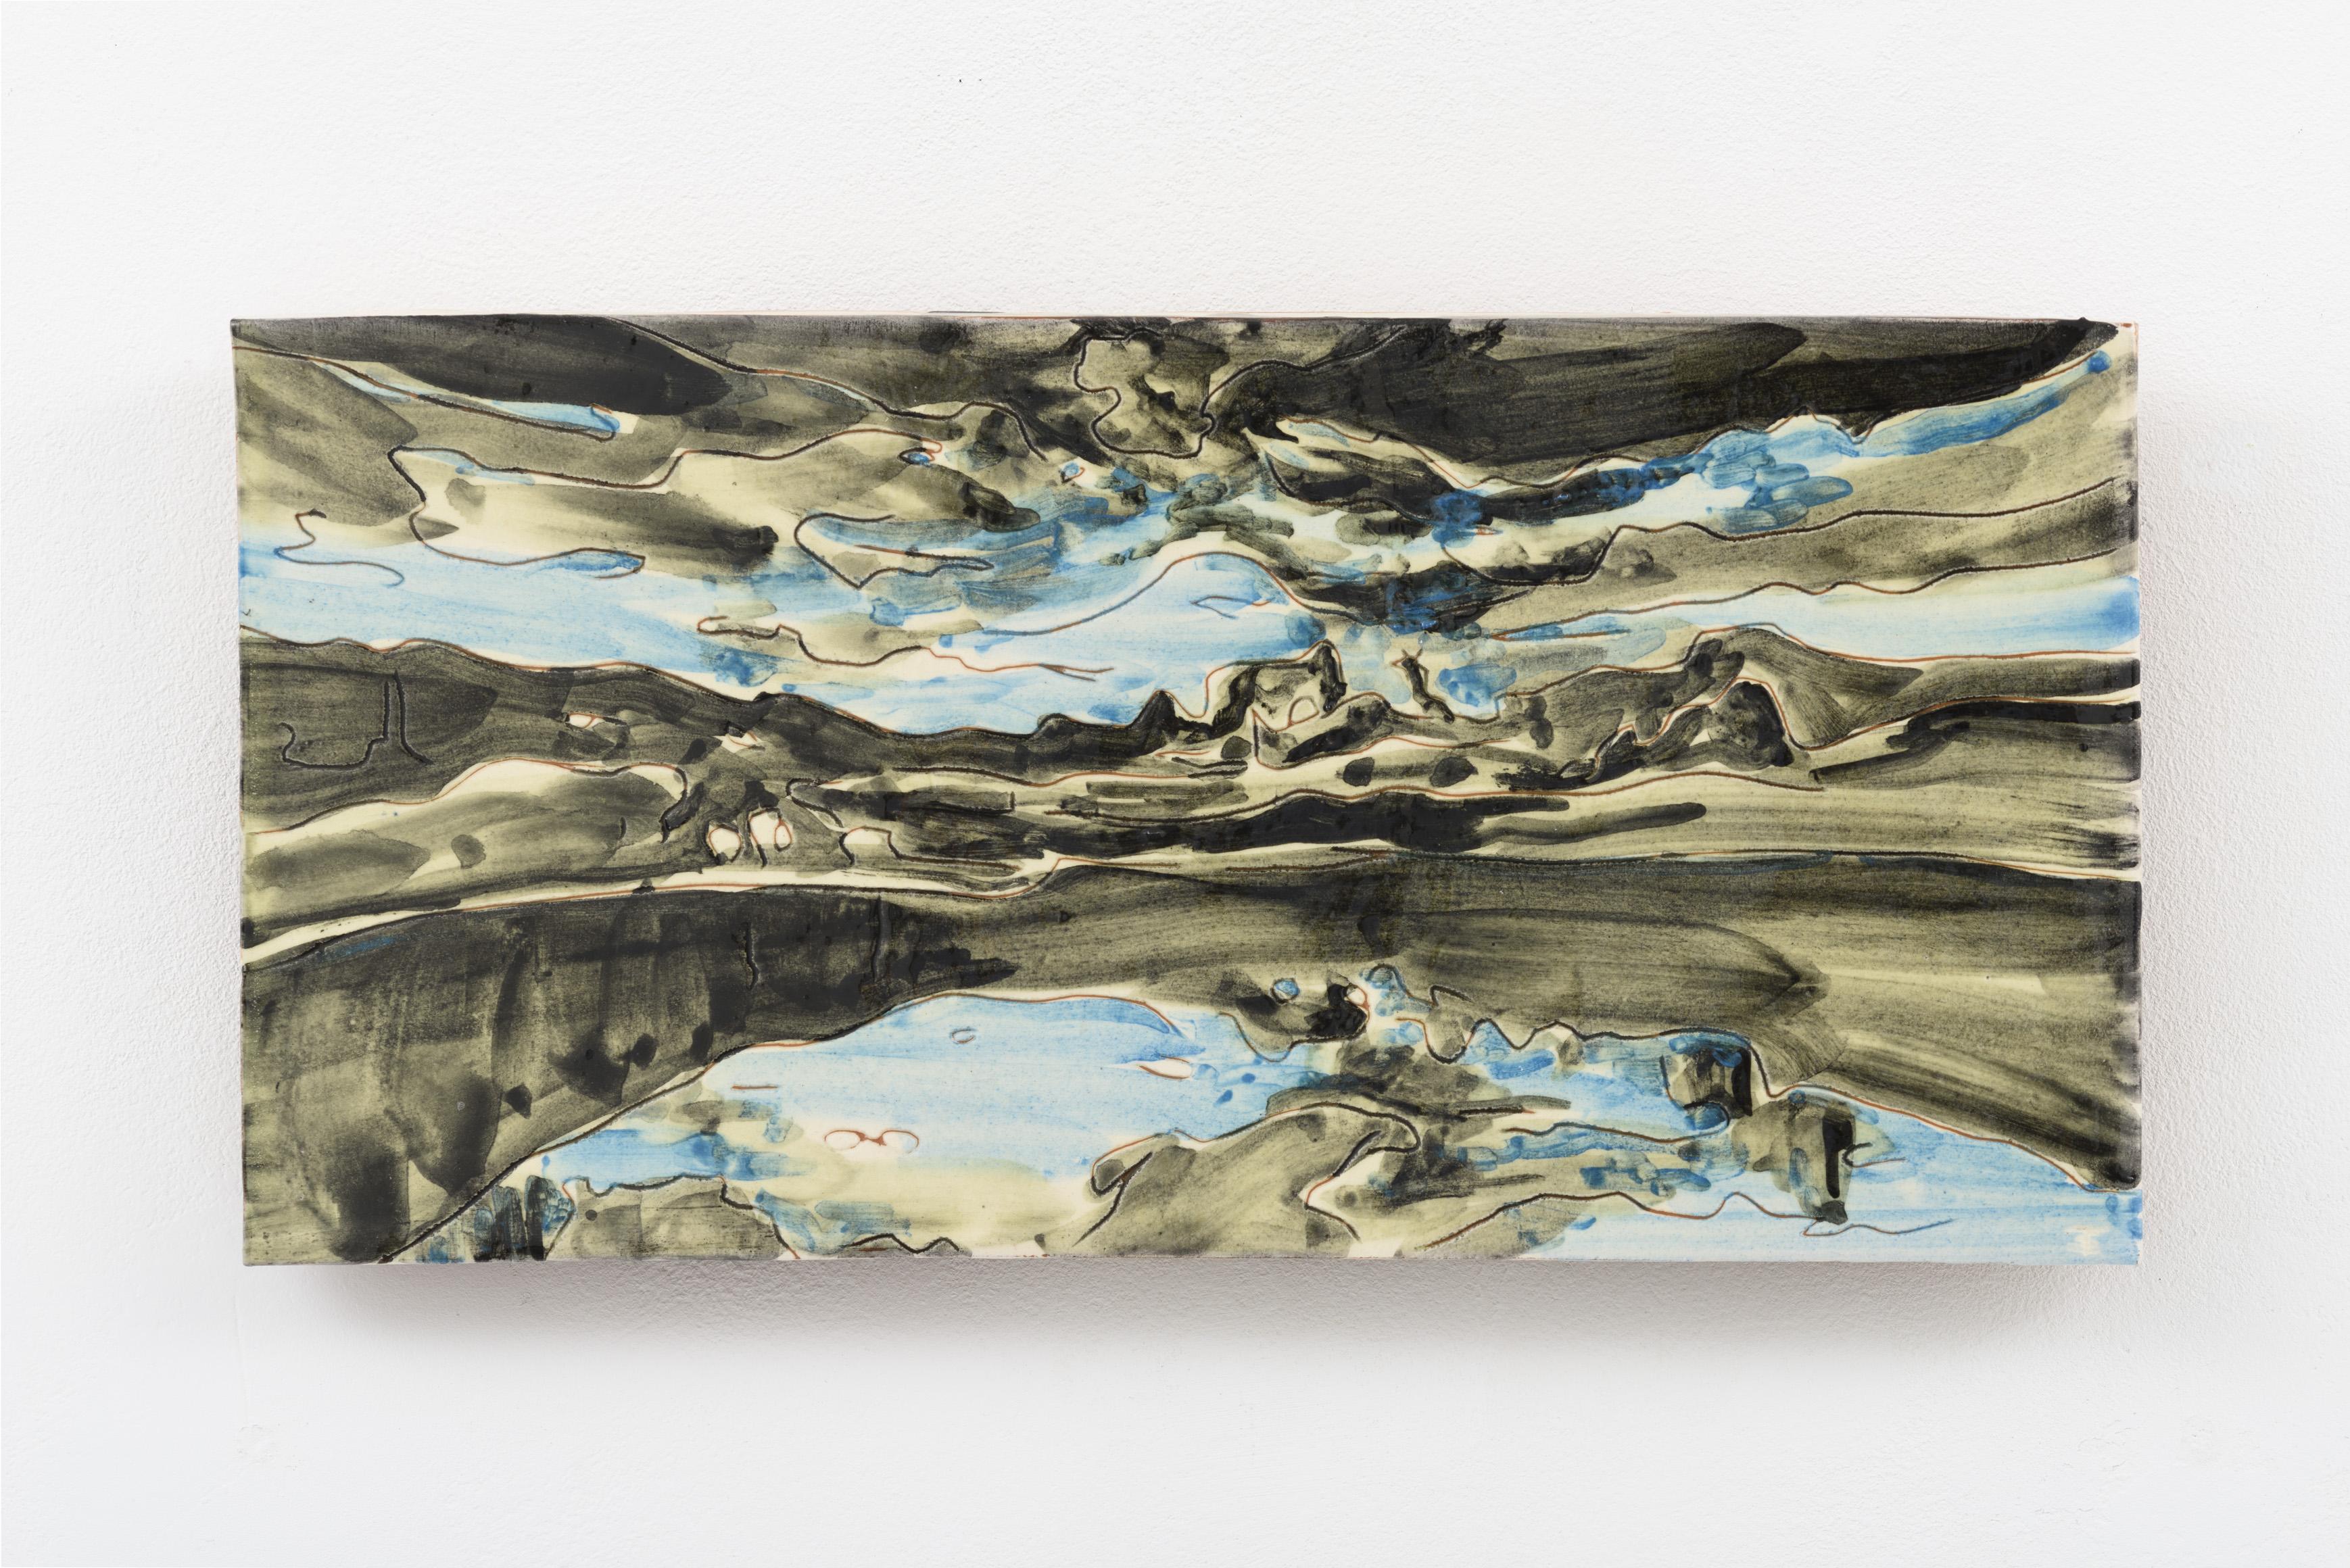 """Pedreira de marmore"", painted ceramic tile, 15 x 29 cm., Portugal 2015"